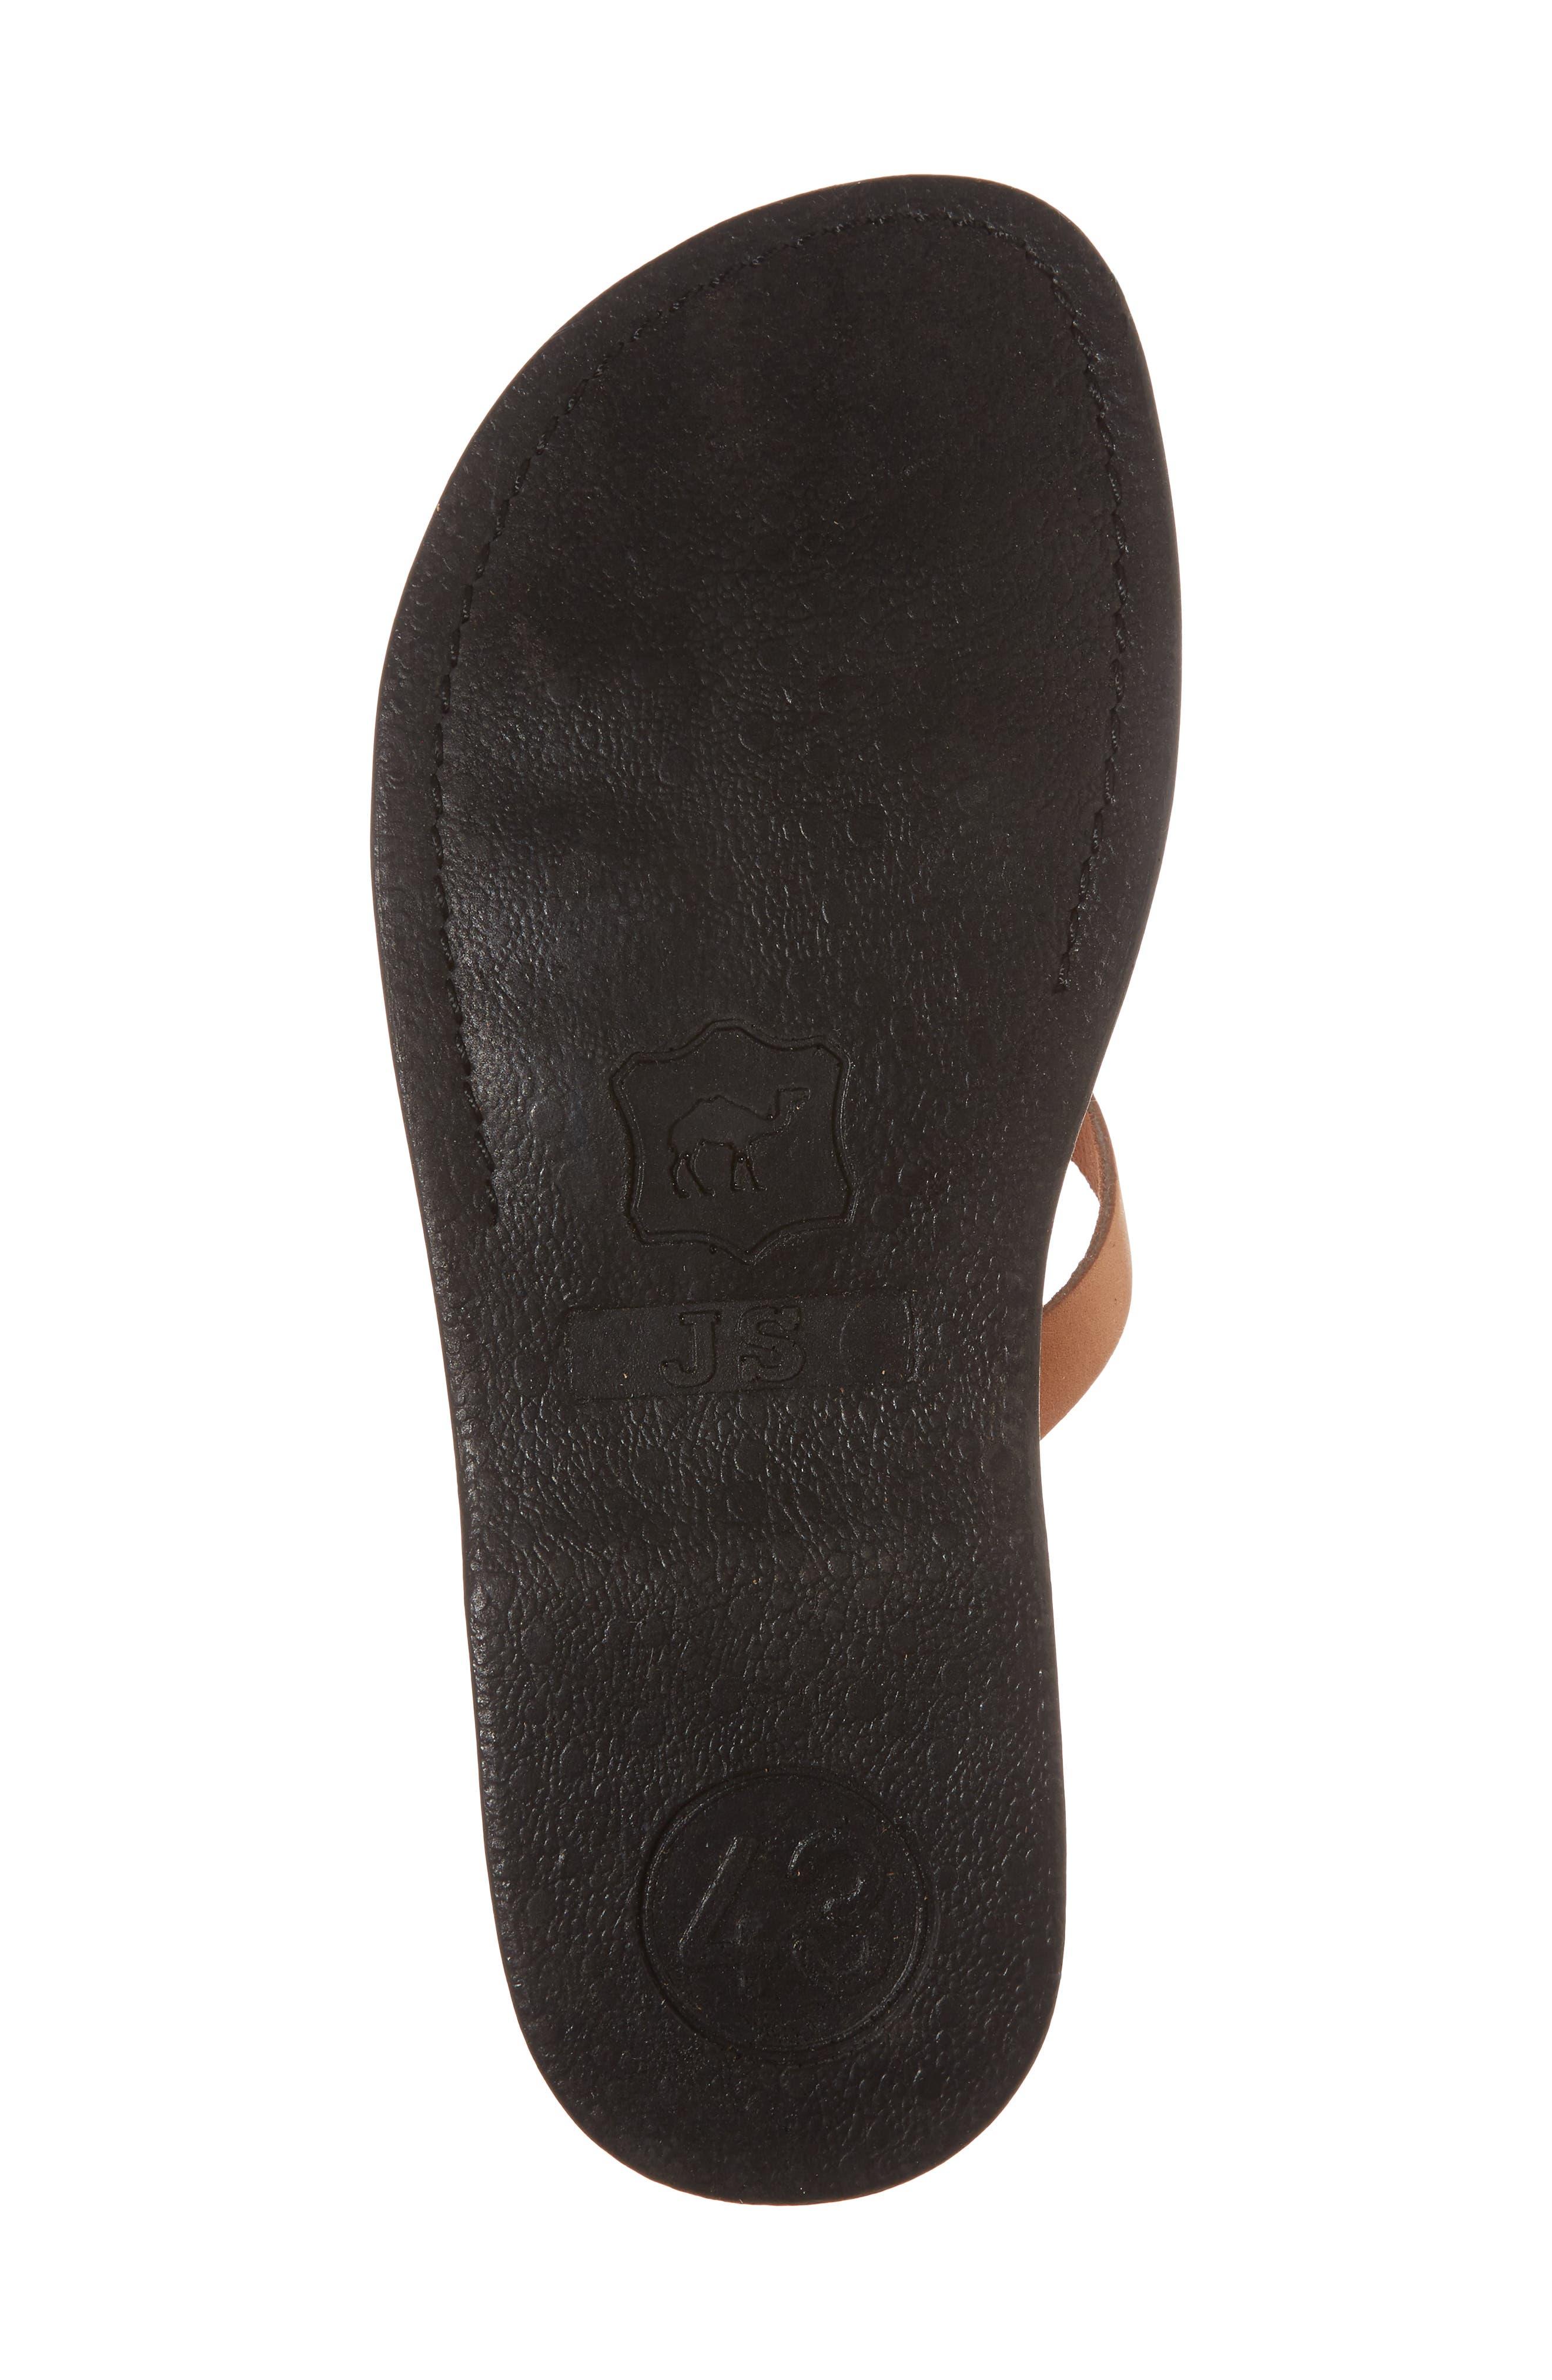 Gad Cross Strap Slide Sandal,                             Alternate thumbnail 6, color,                             Tan Leather